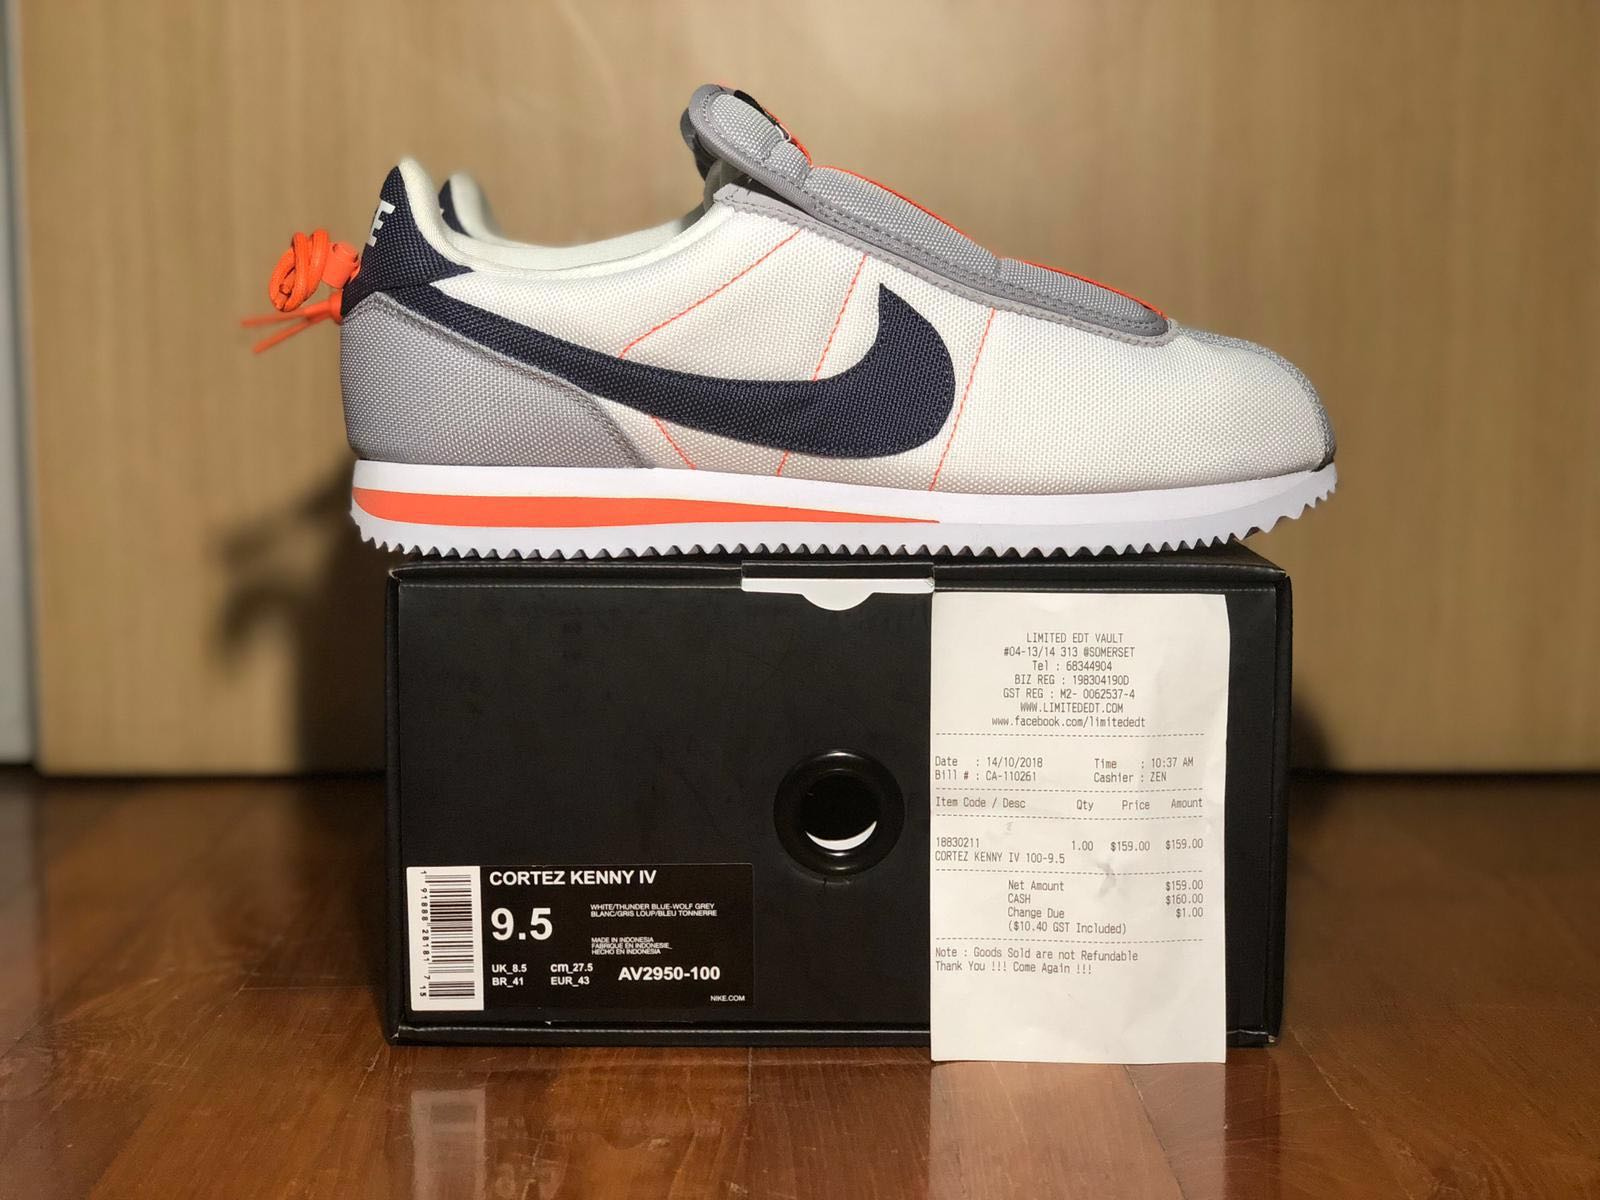 8a38e924091 Nike Kendrick Lamar Cortez Kenny IV Basic Slip